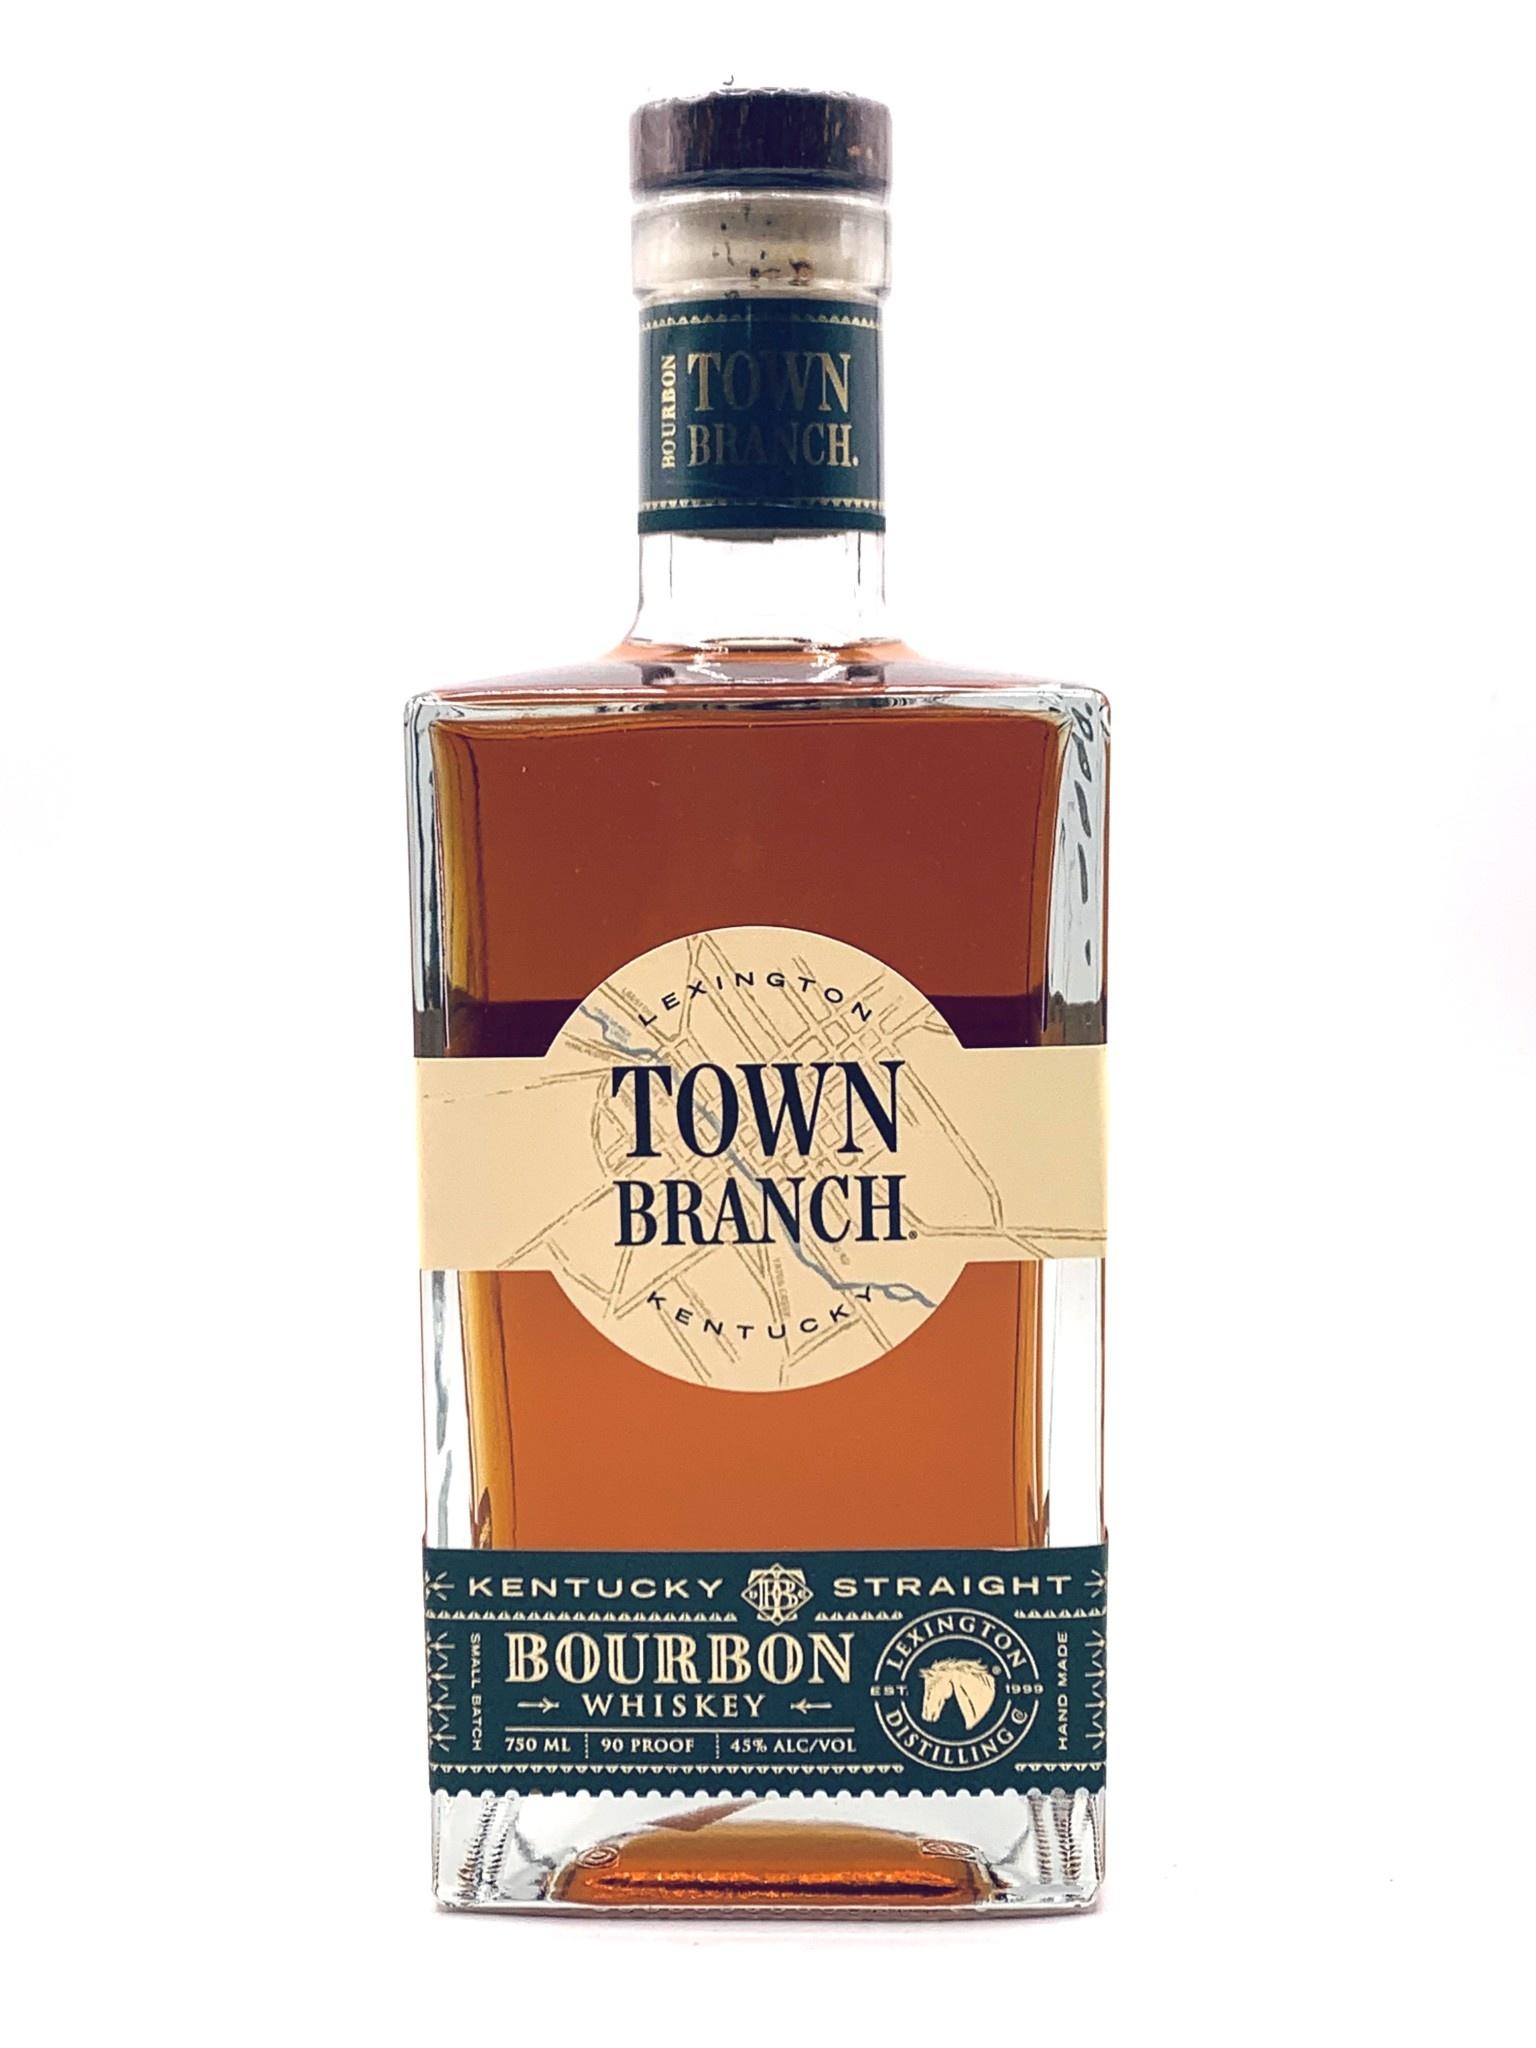 Town Branch Kentucky Straight Bourbon Whiskey 750ml (90 Proof)